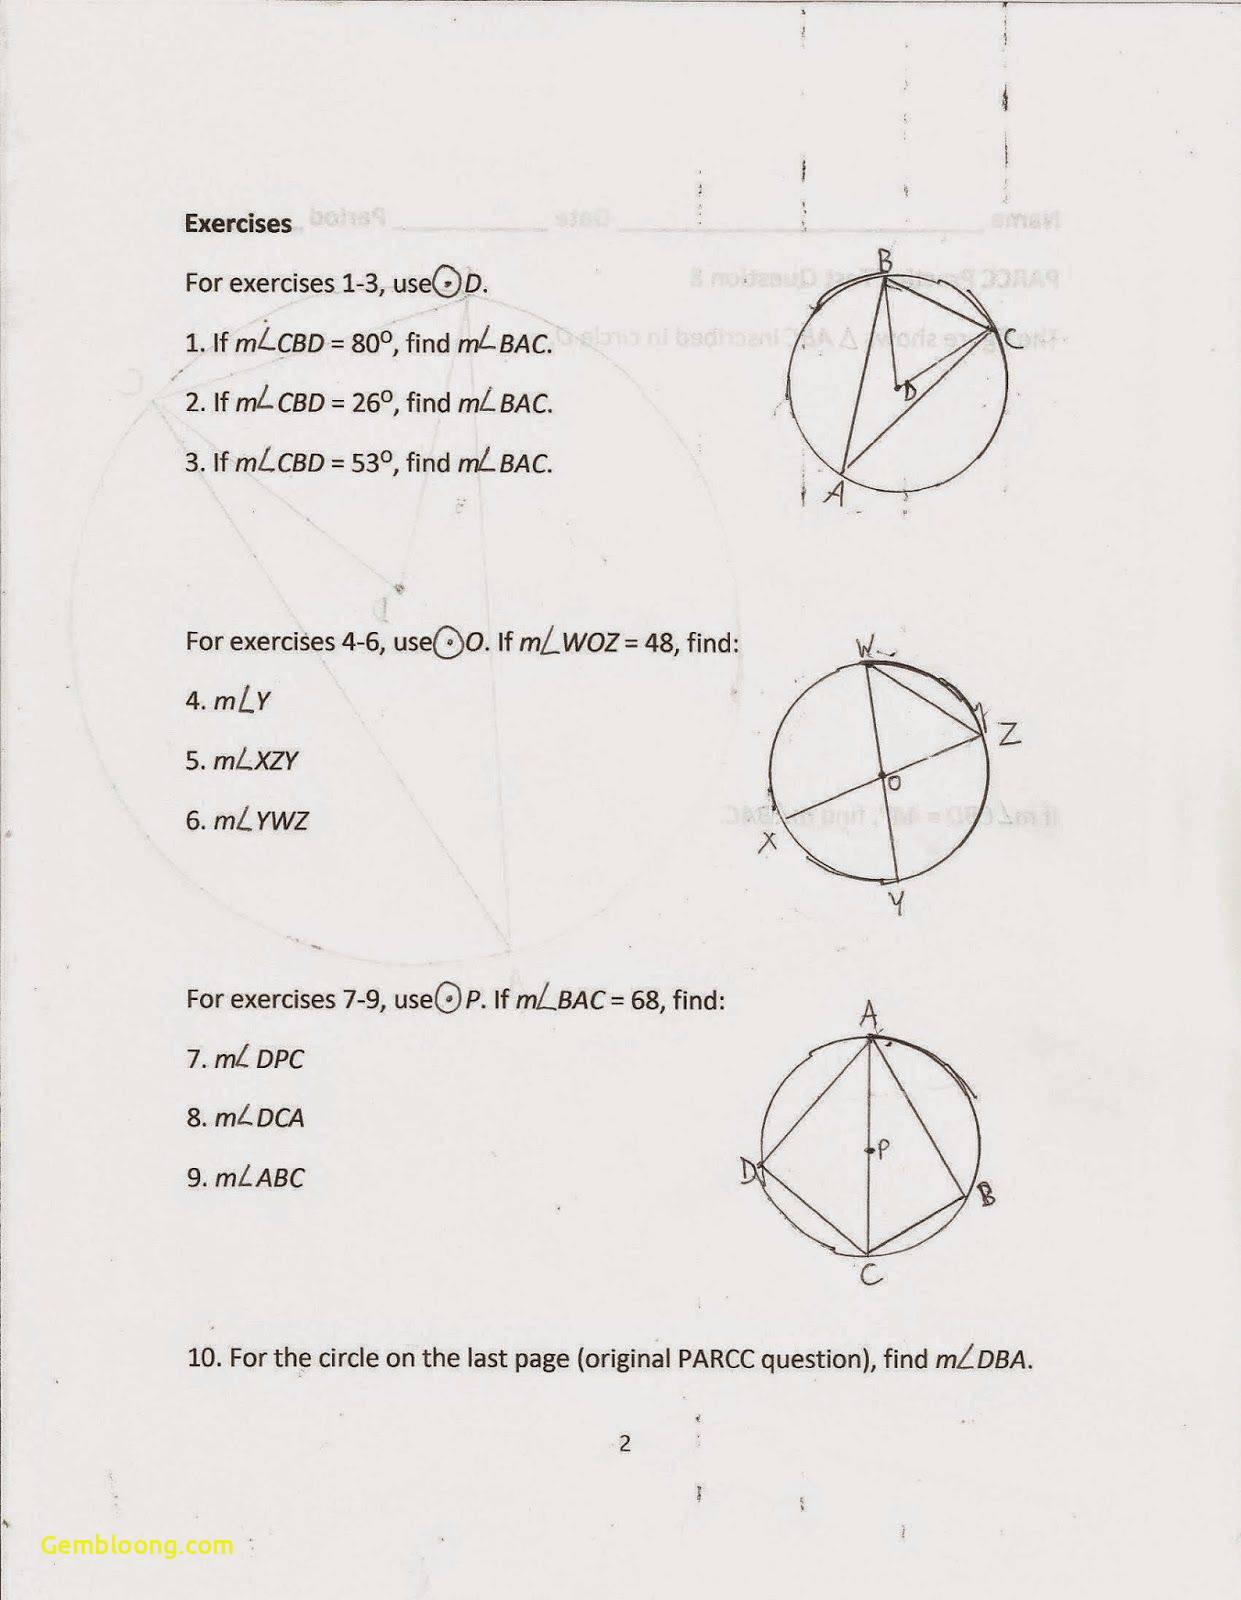 Inscribed Angles Worksheet Cramerforcongress